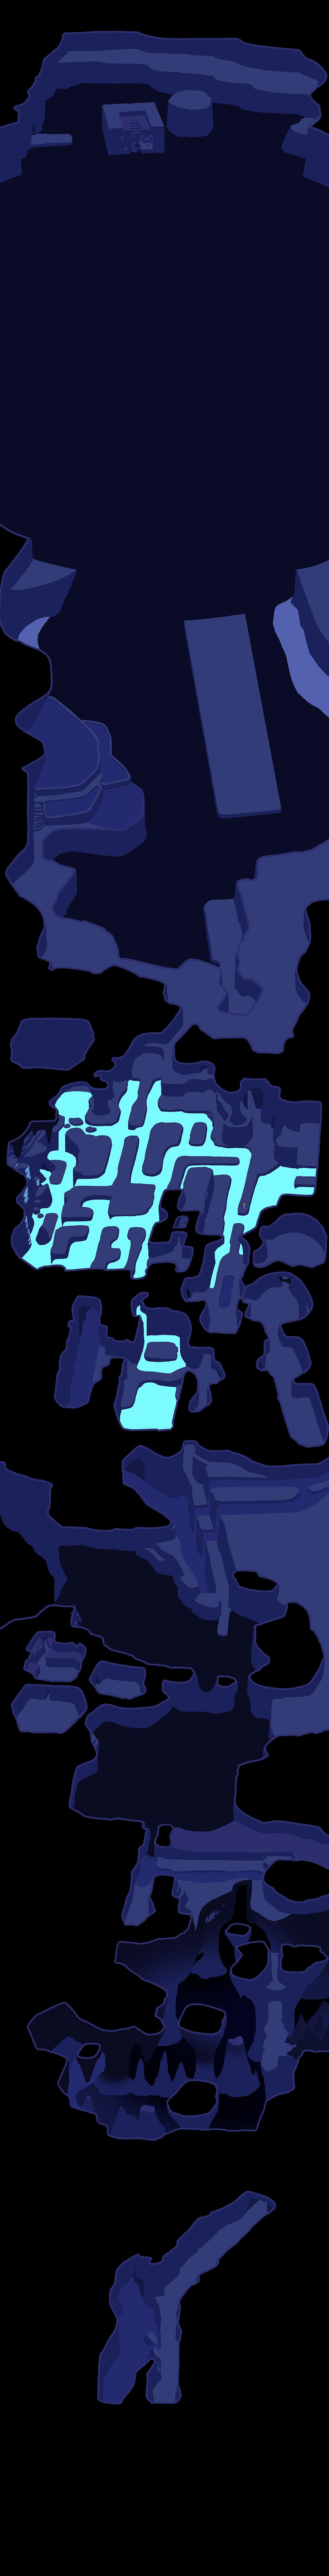 UR_Web_Map05.jpg